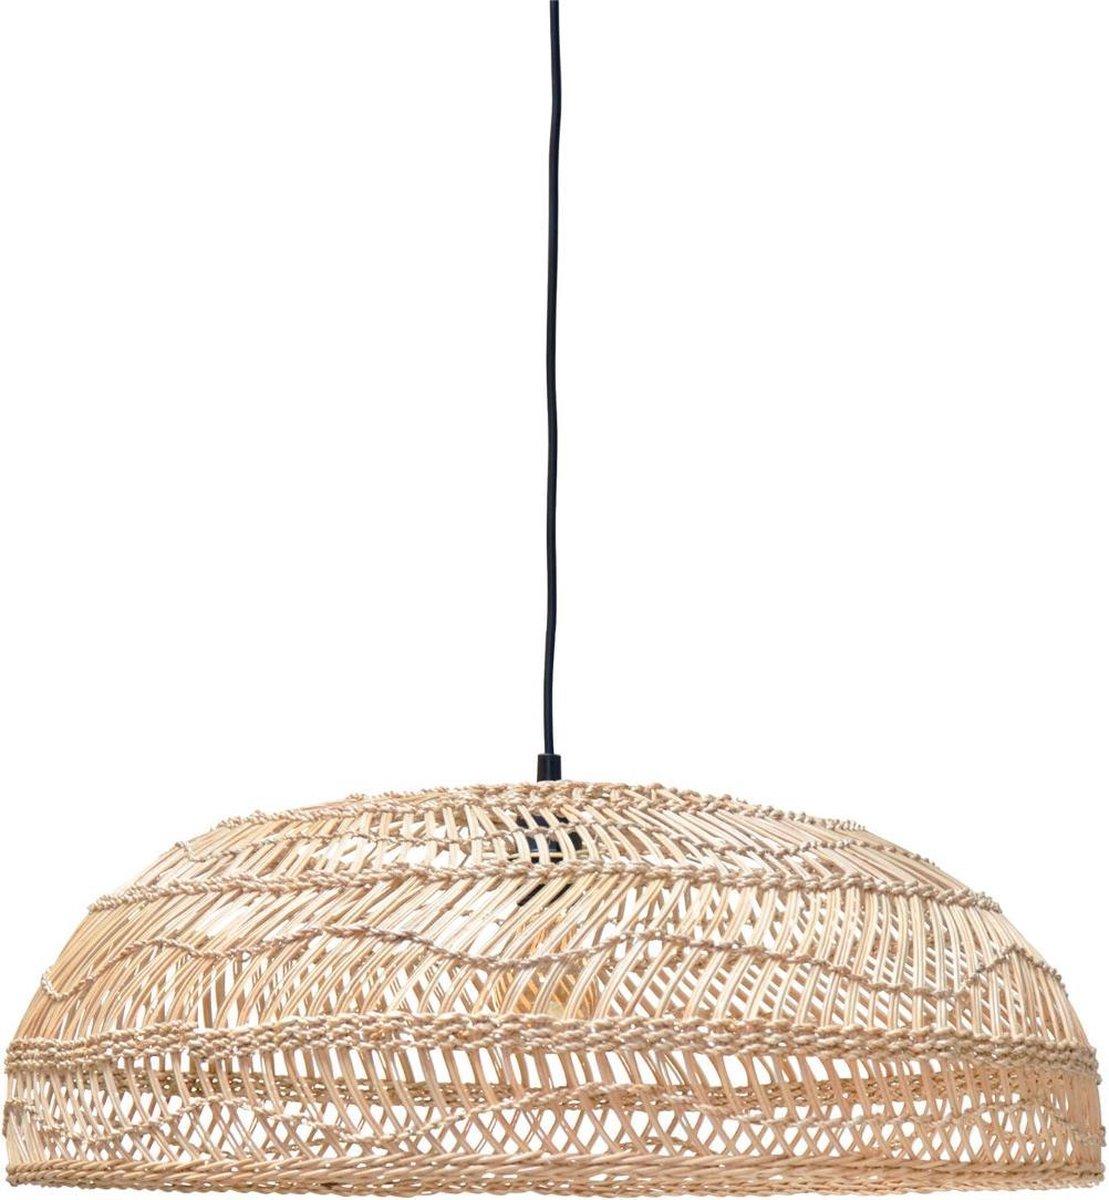 Bol Com Hk Living Hanglamp Riet Naturel Medium 20 X 80 X 80